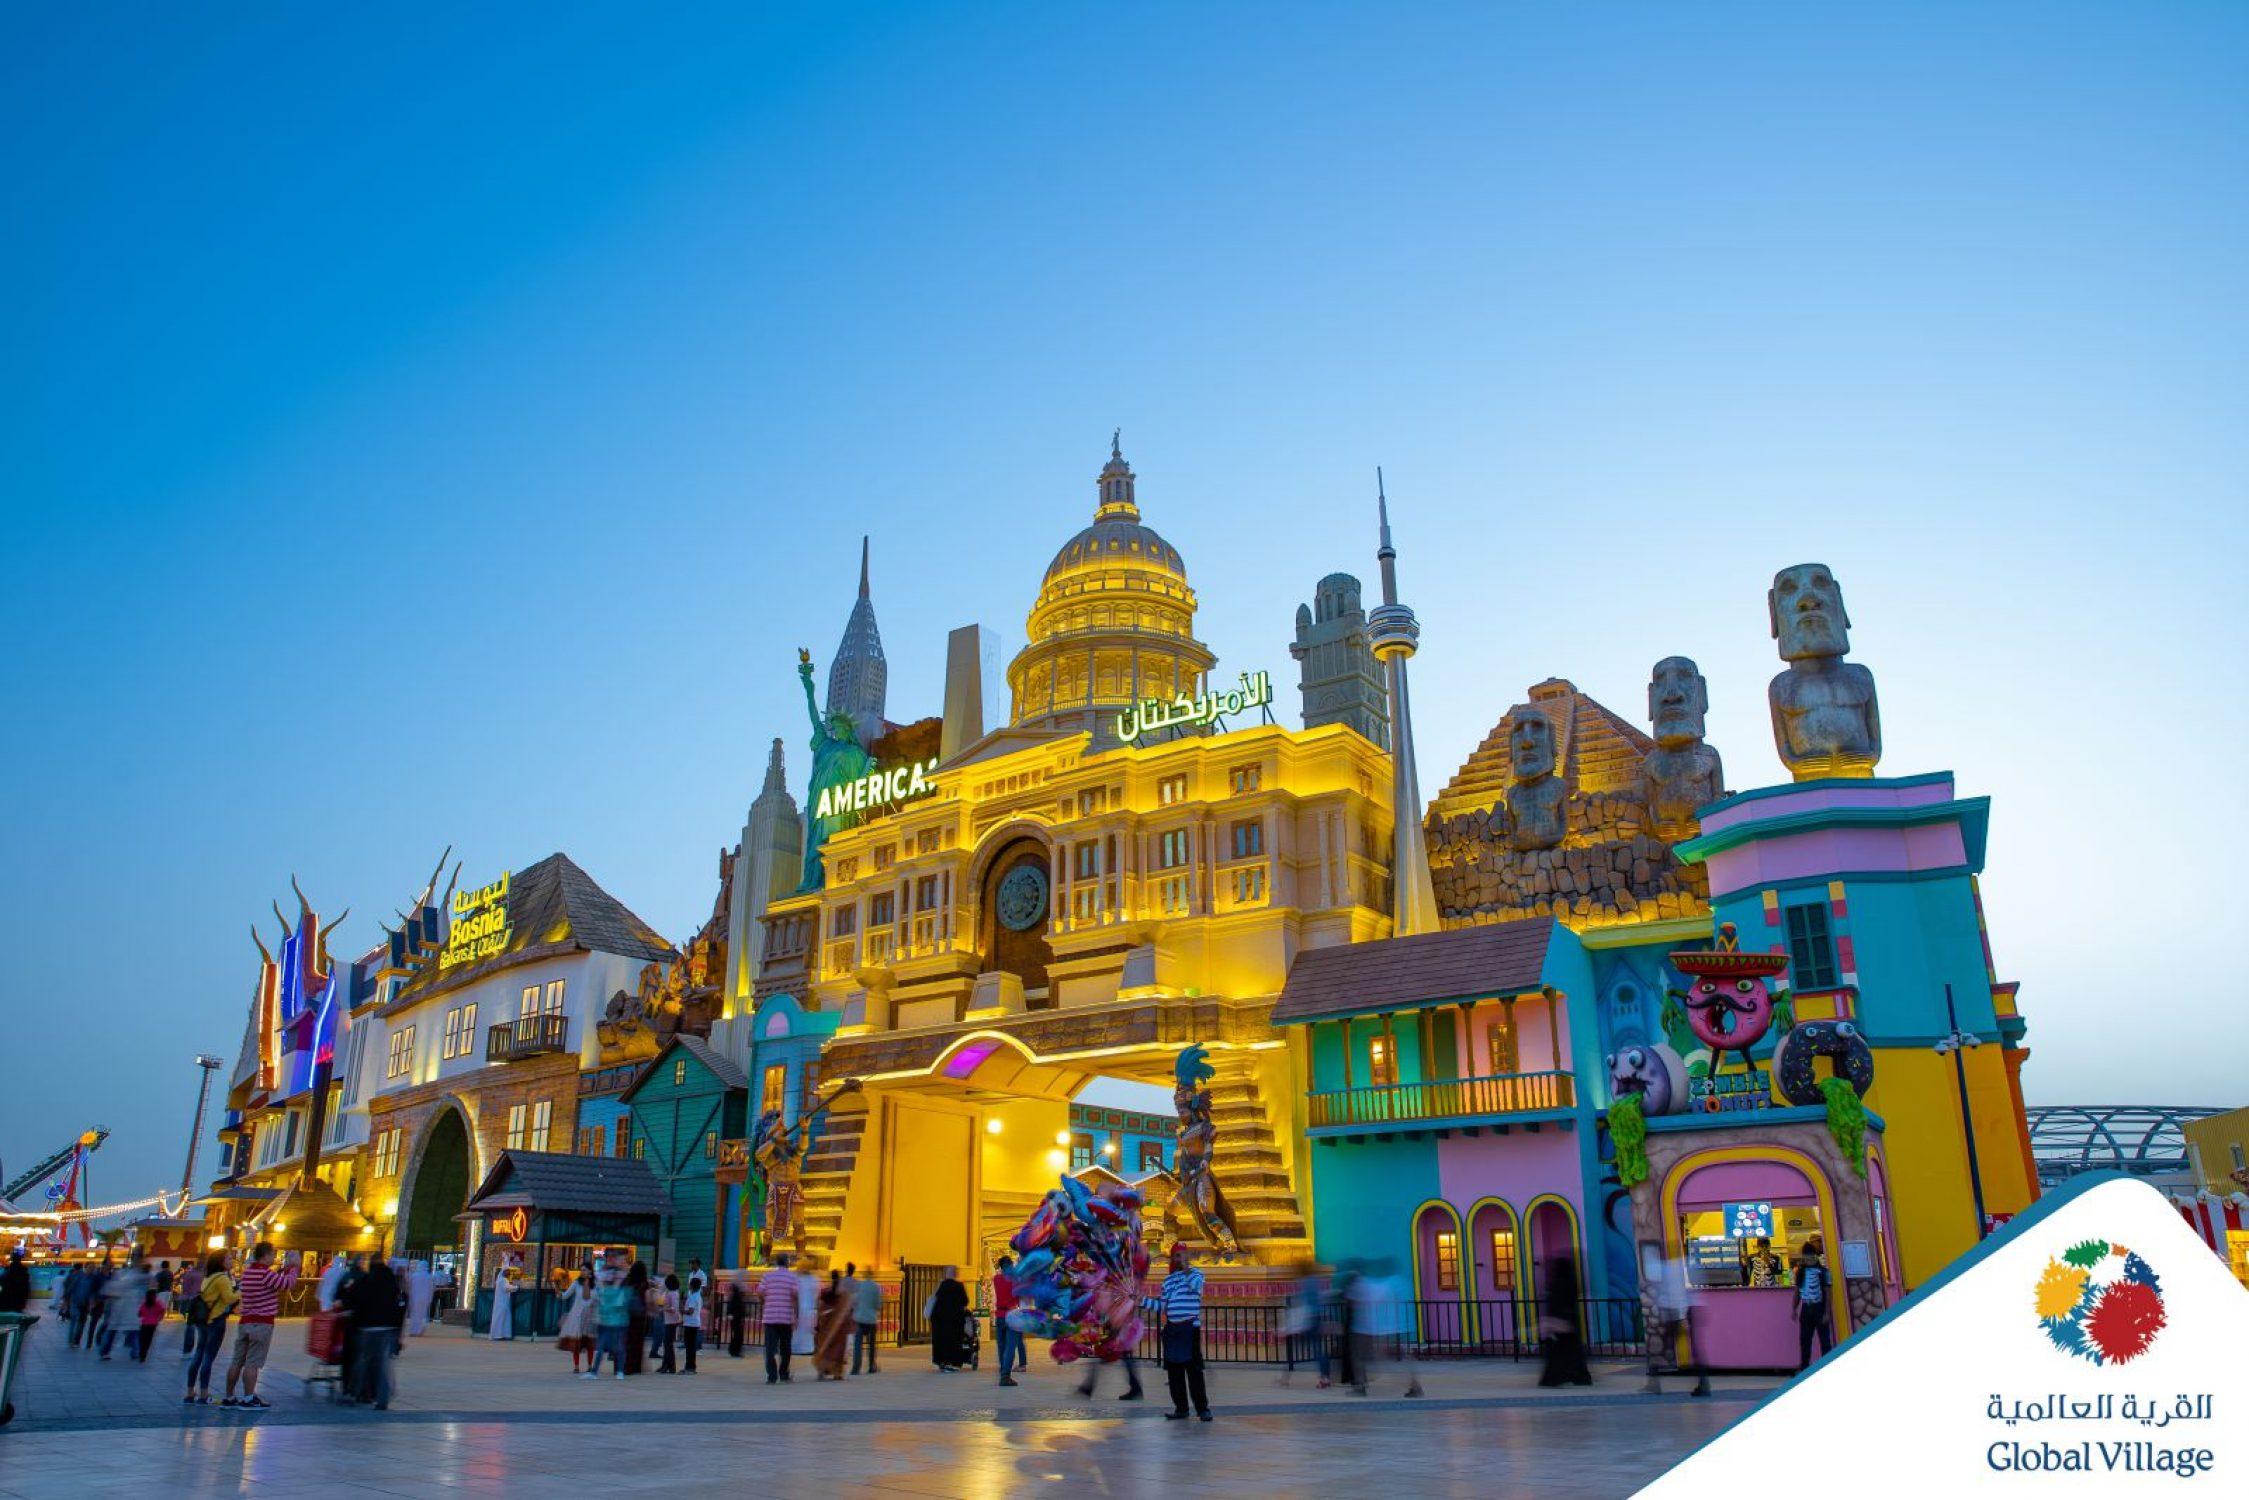 Global Village Dubai opening date 2019 – 2020